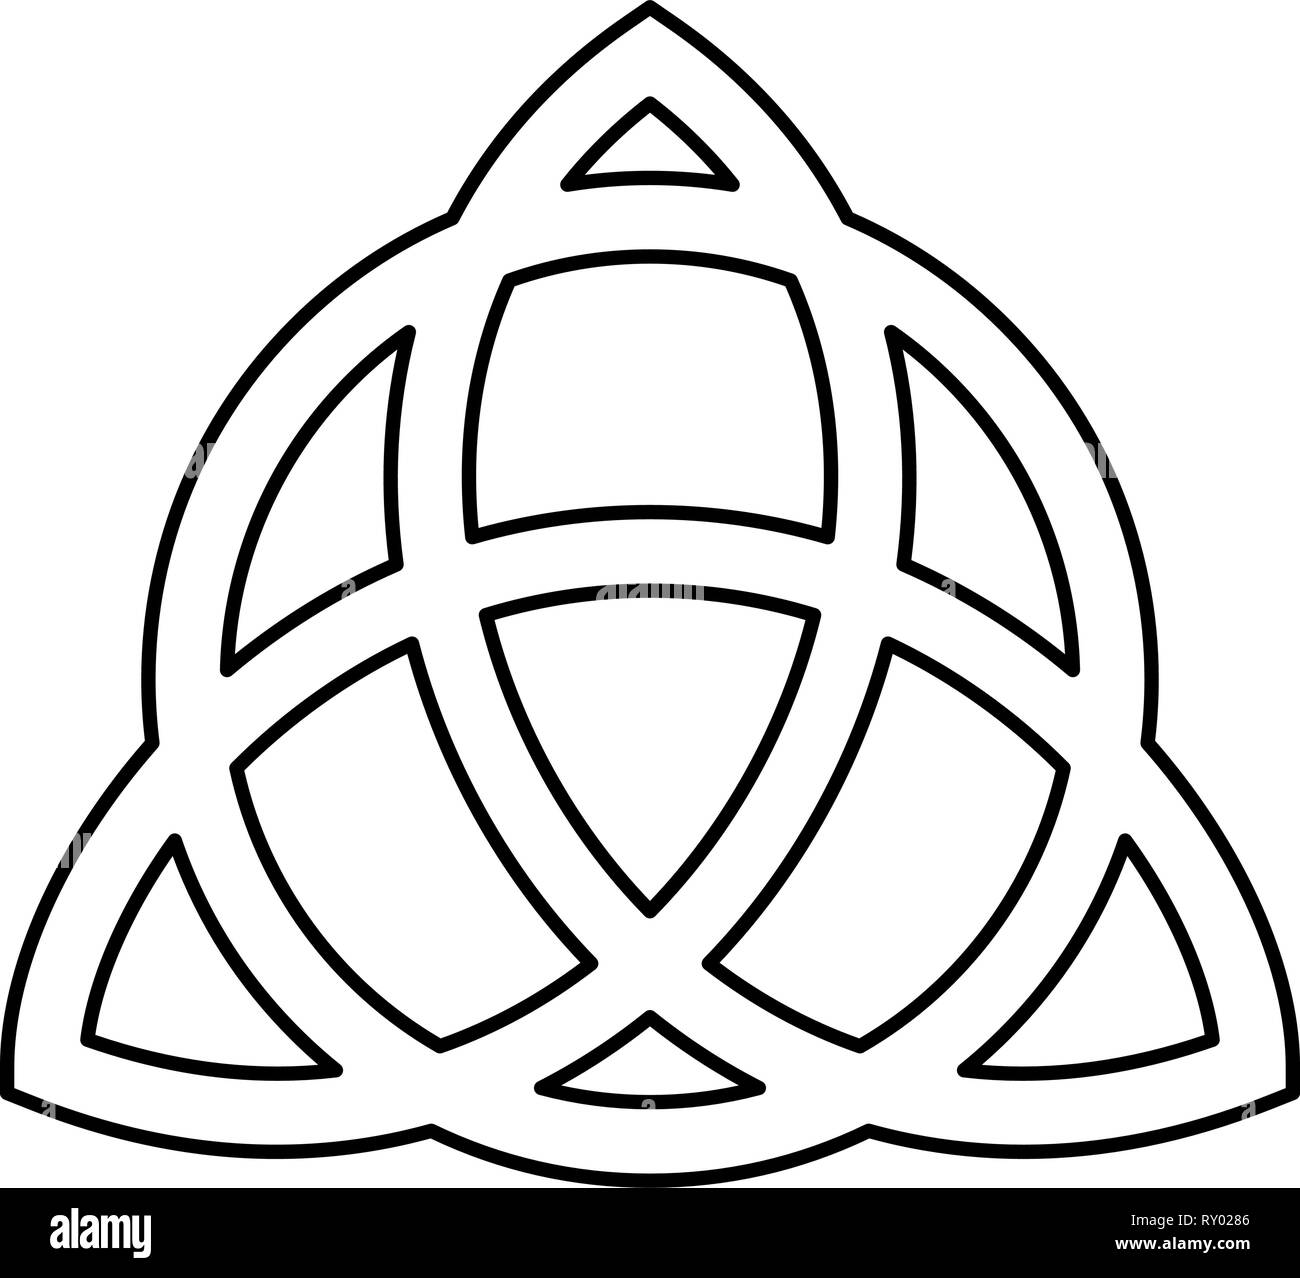 Trikvetr knot with circle Power of three viking symbol